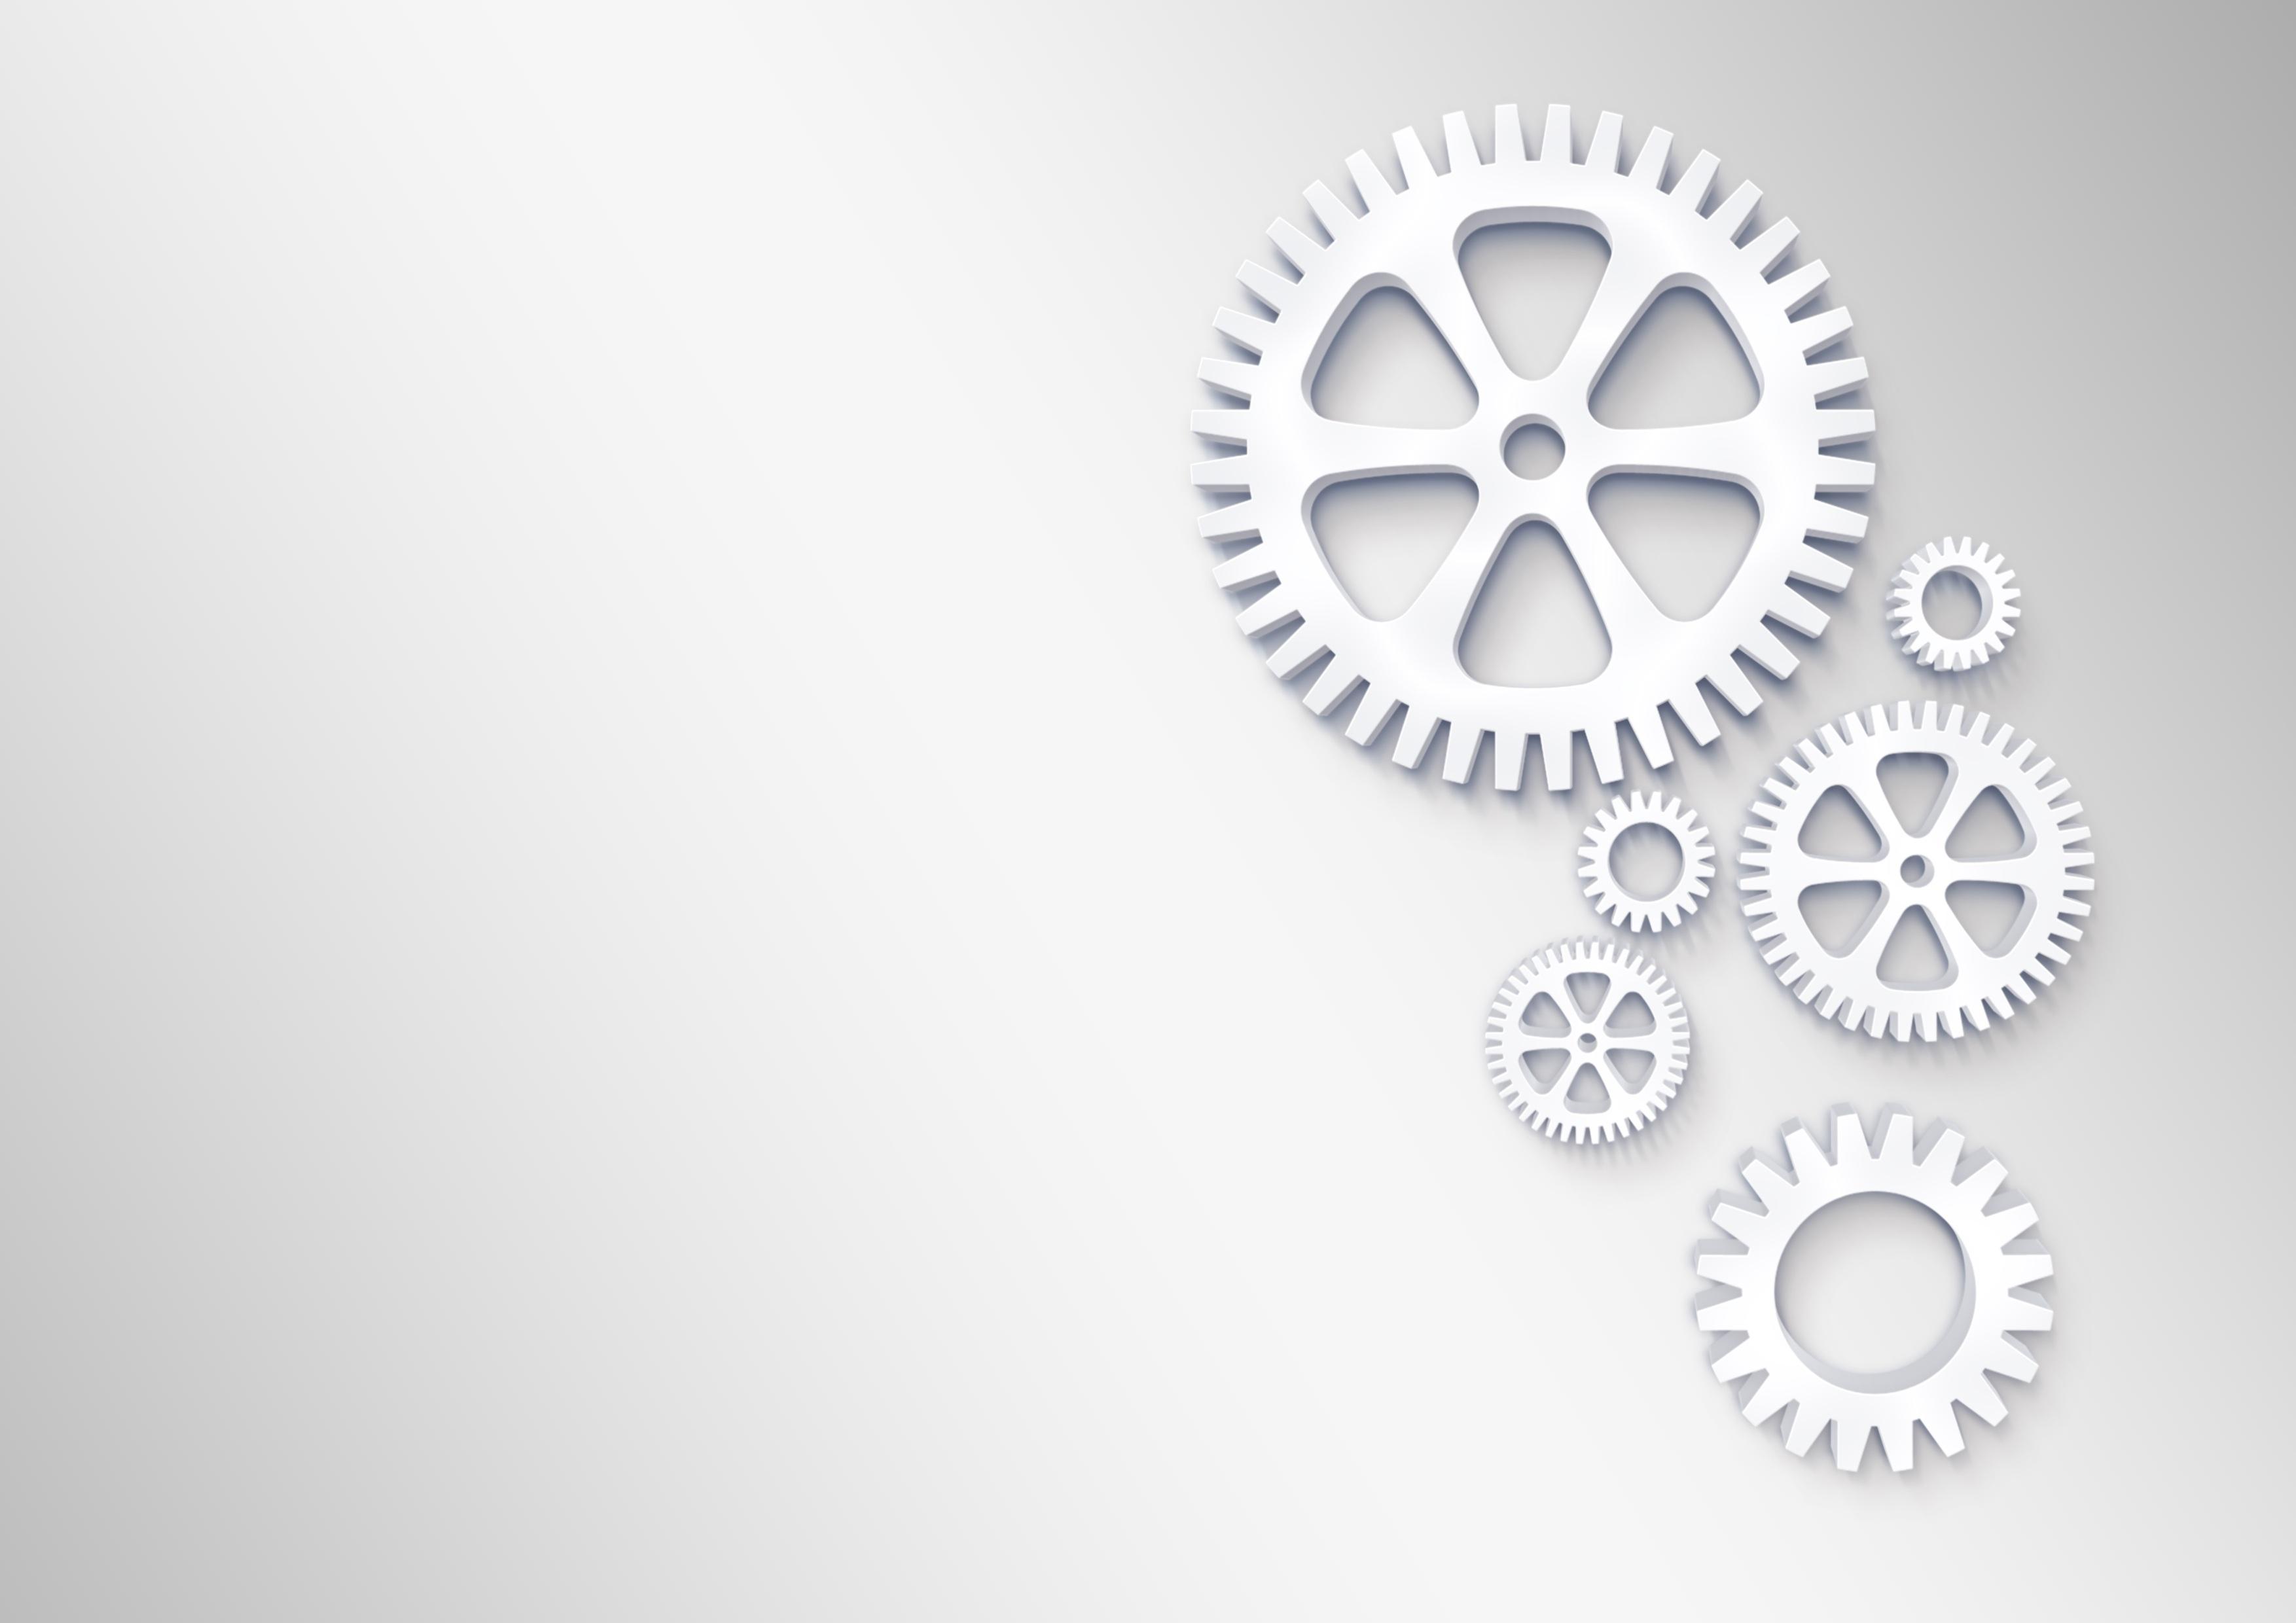 creative-pattern-empty-modern-circle-futuristic-922969-pxhere.com.jpg